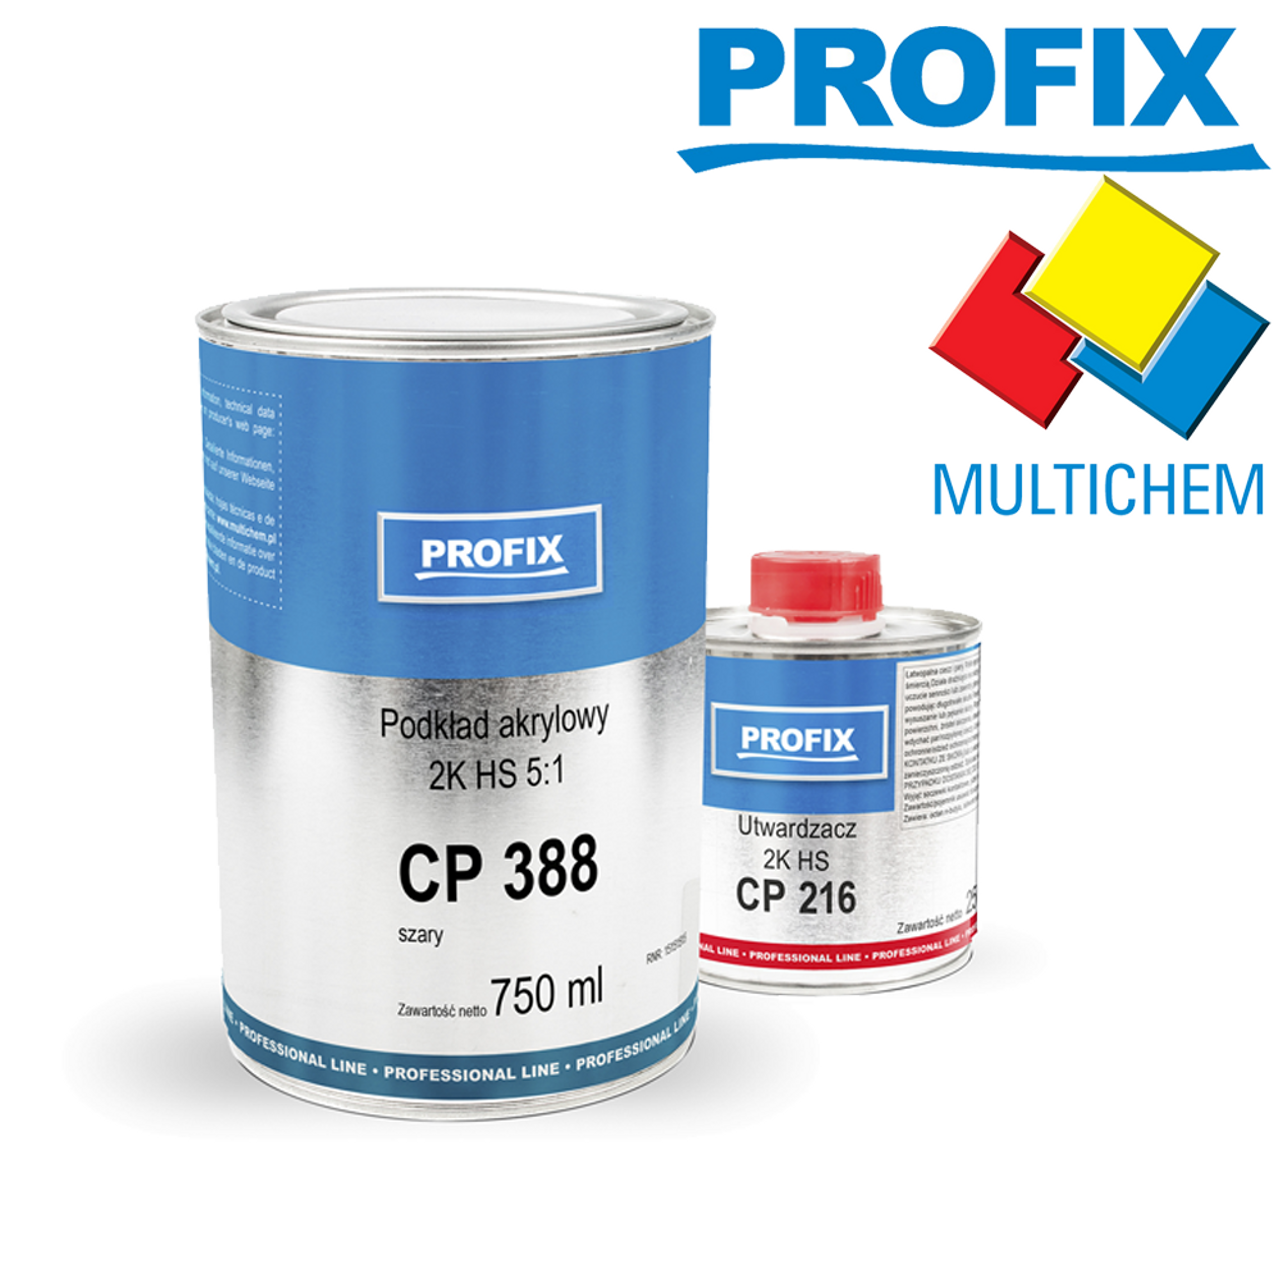 Profix Acrylic Primer Filler CP 388 2K HS 5:1 750ml Grey + Hardener